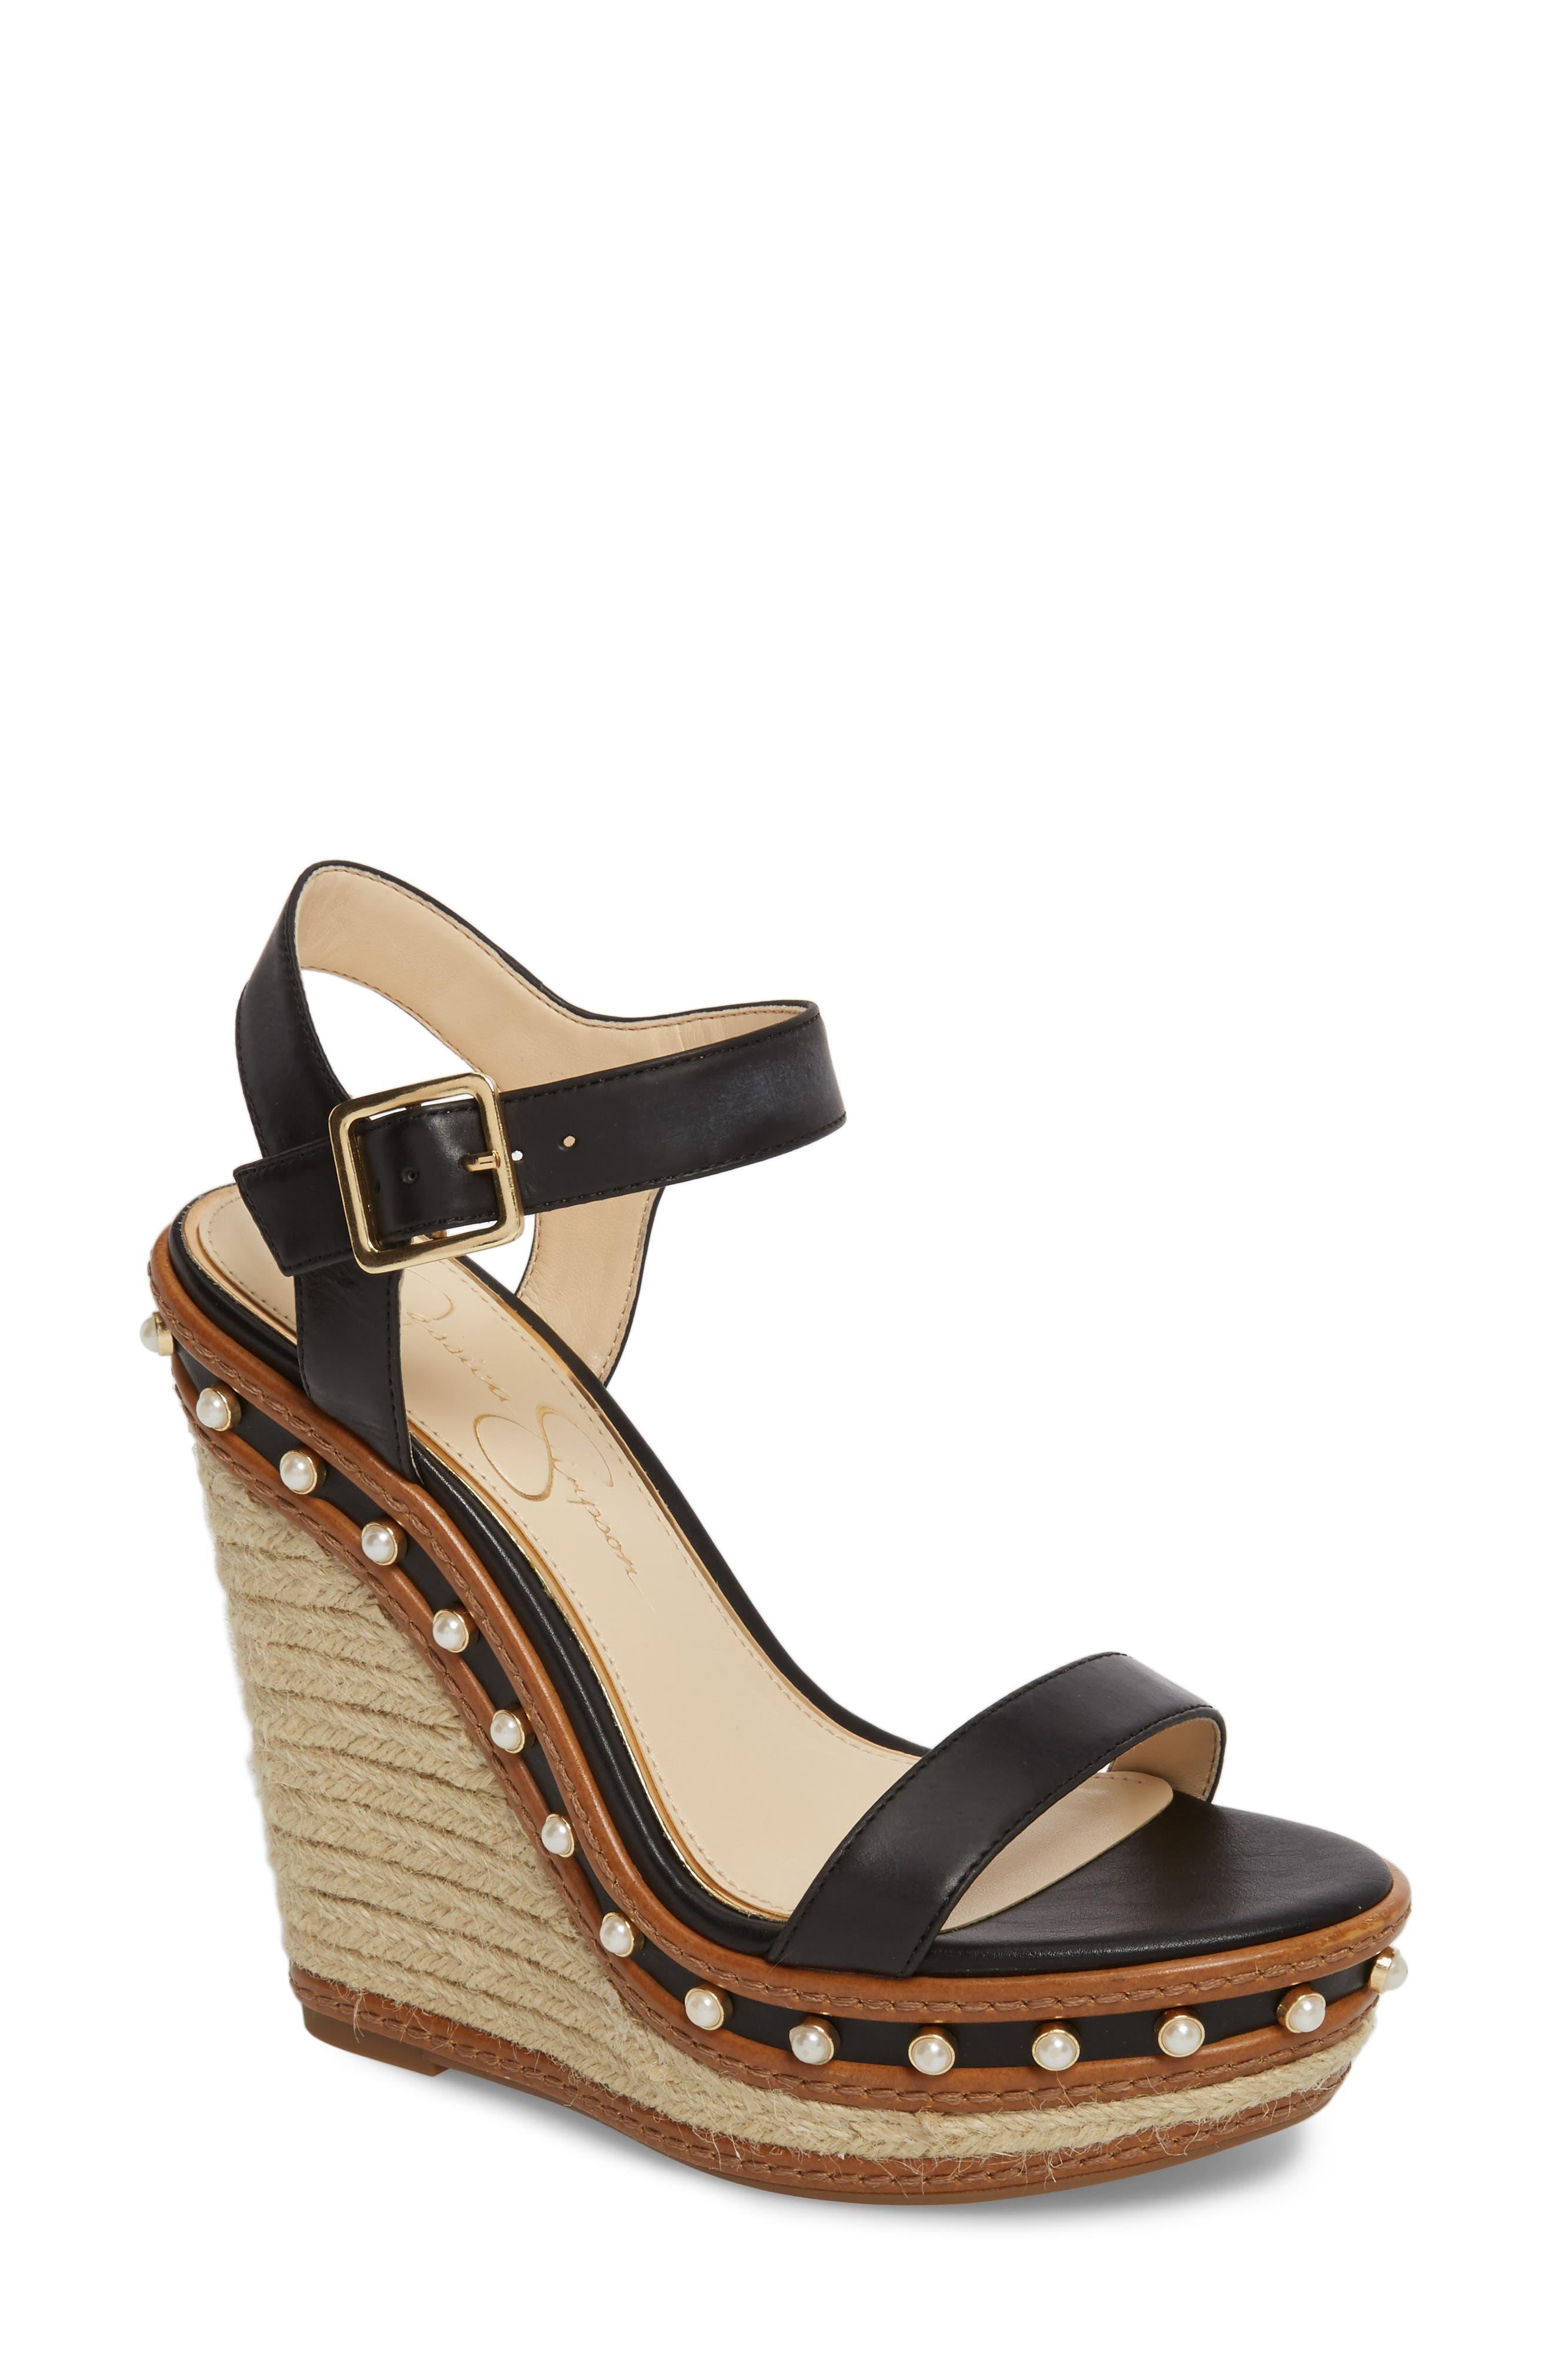 Arly Espadrille Wedge Sandal,                         Main,                         color, BLACK